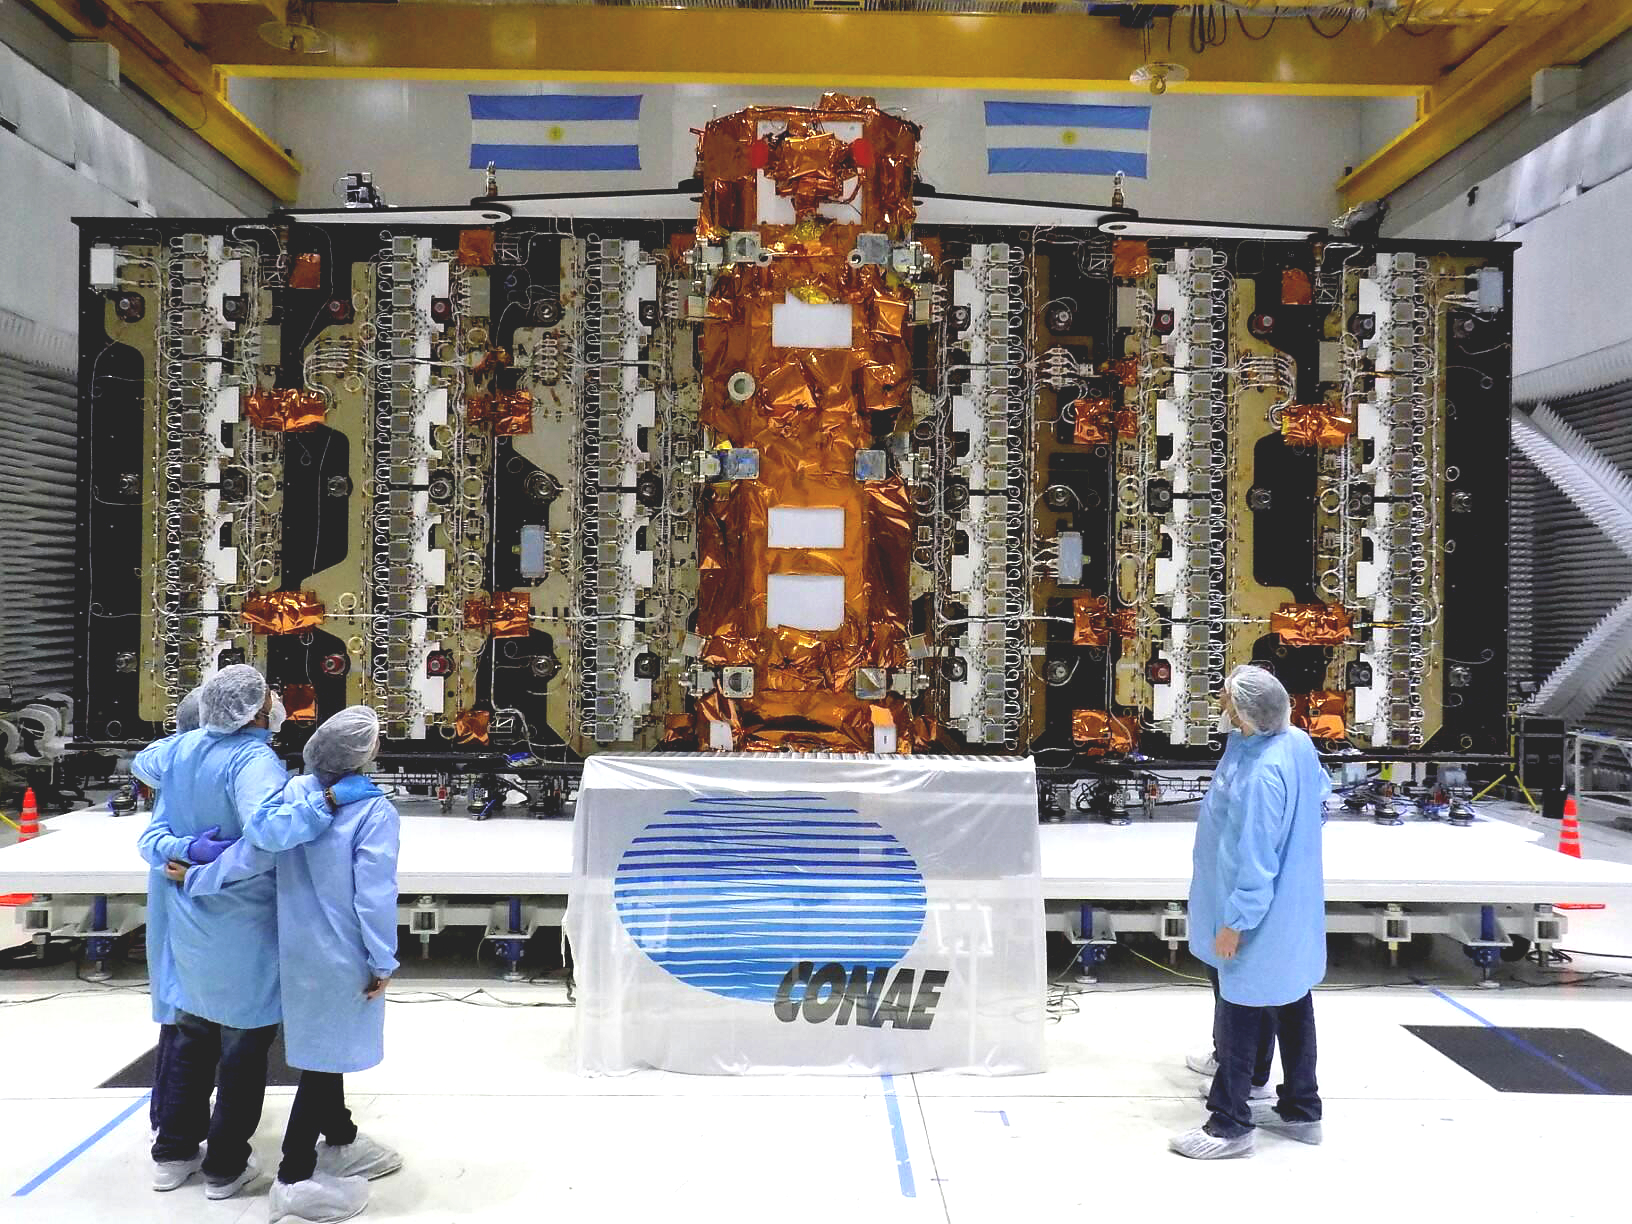 SAOCOM 1A y SAOCOM 1B - Satélites hechos en Argentina SateliteSAOCOM1A_3editPruebasFinales_INVAP